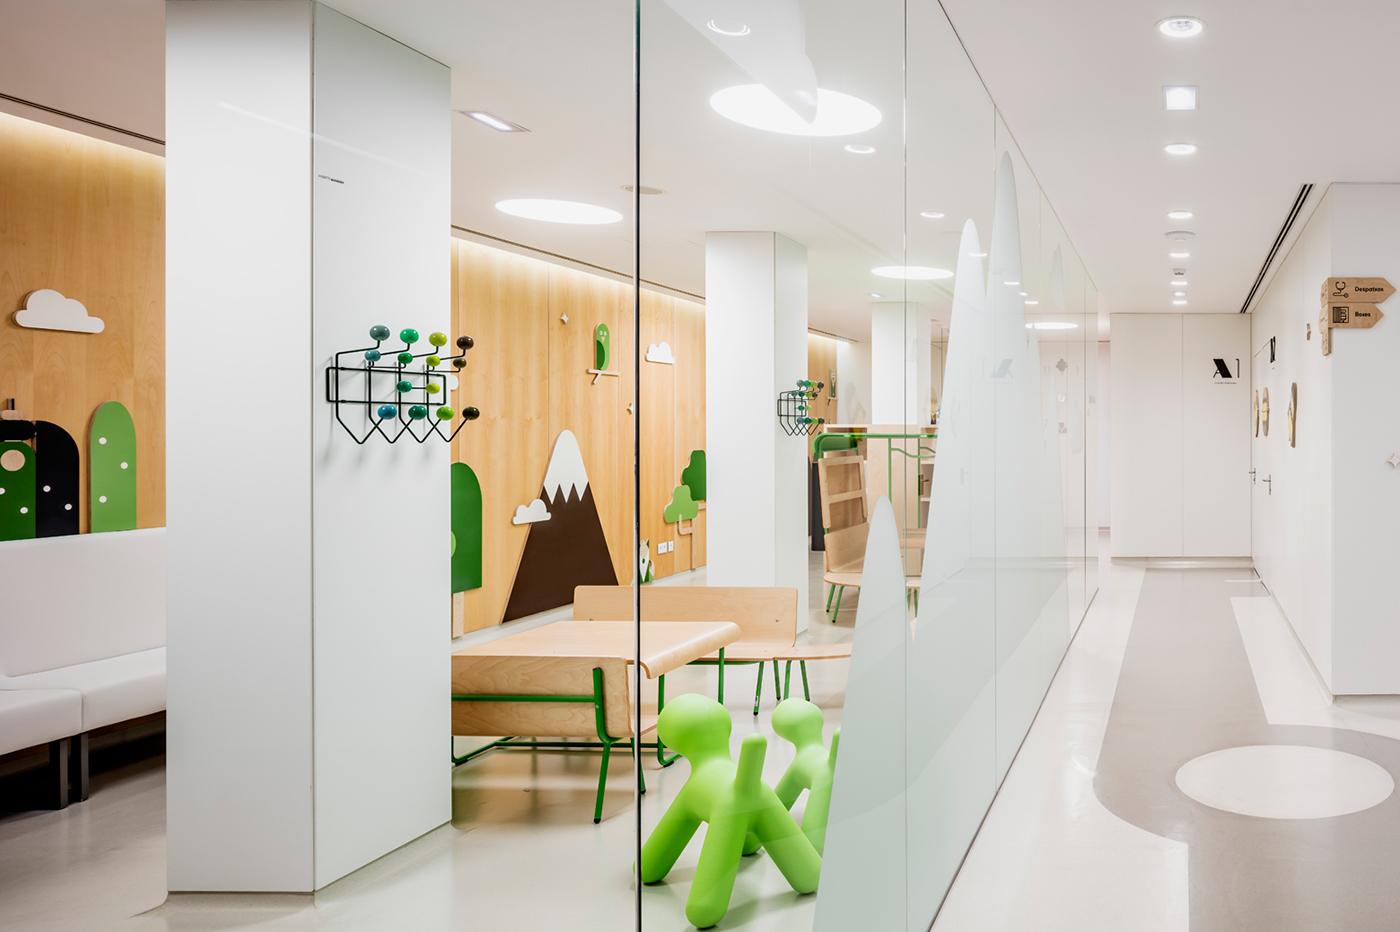 rgb_creative_ParcdAtencions_hospital_design_015